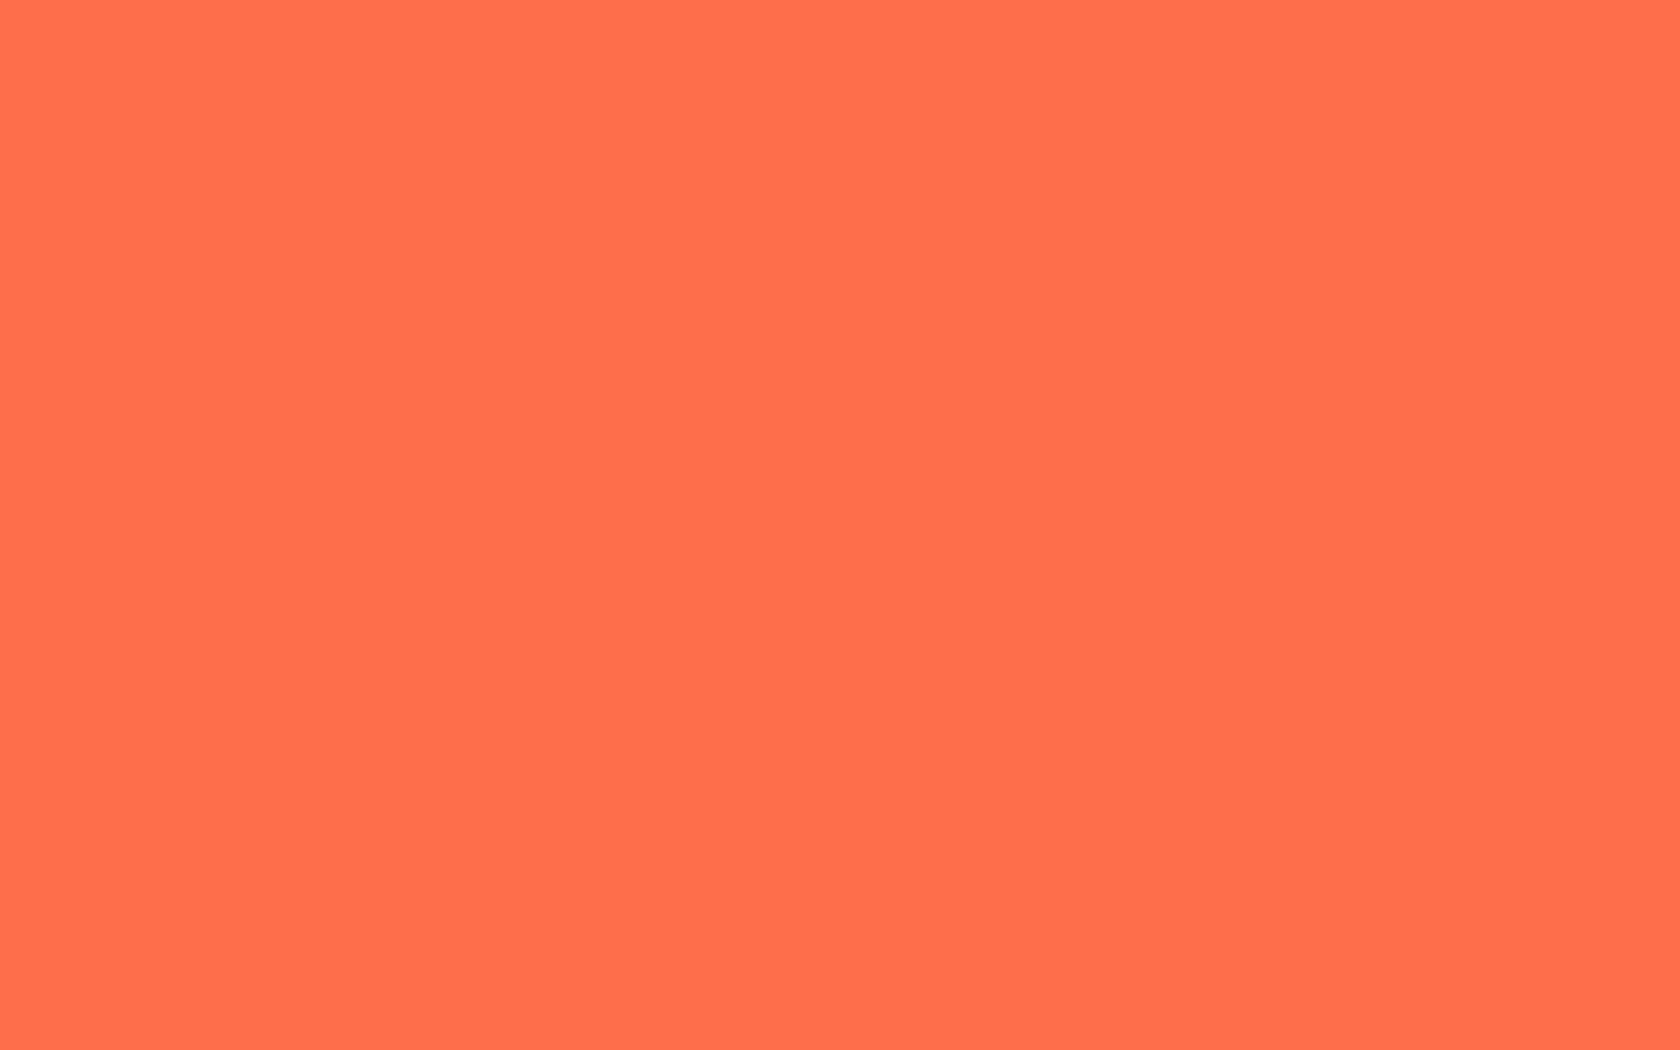 1680x1050 Outrageous Orange Solid Color Background